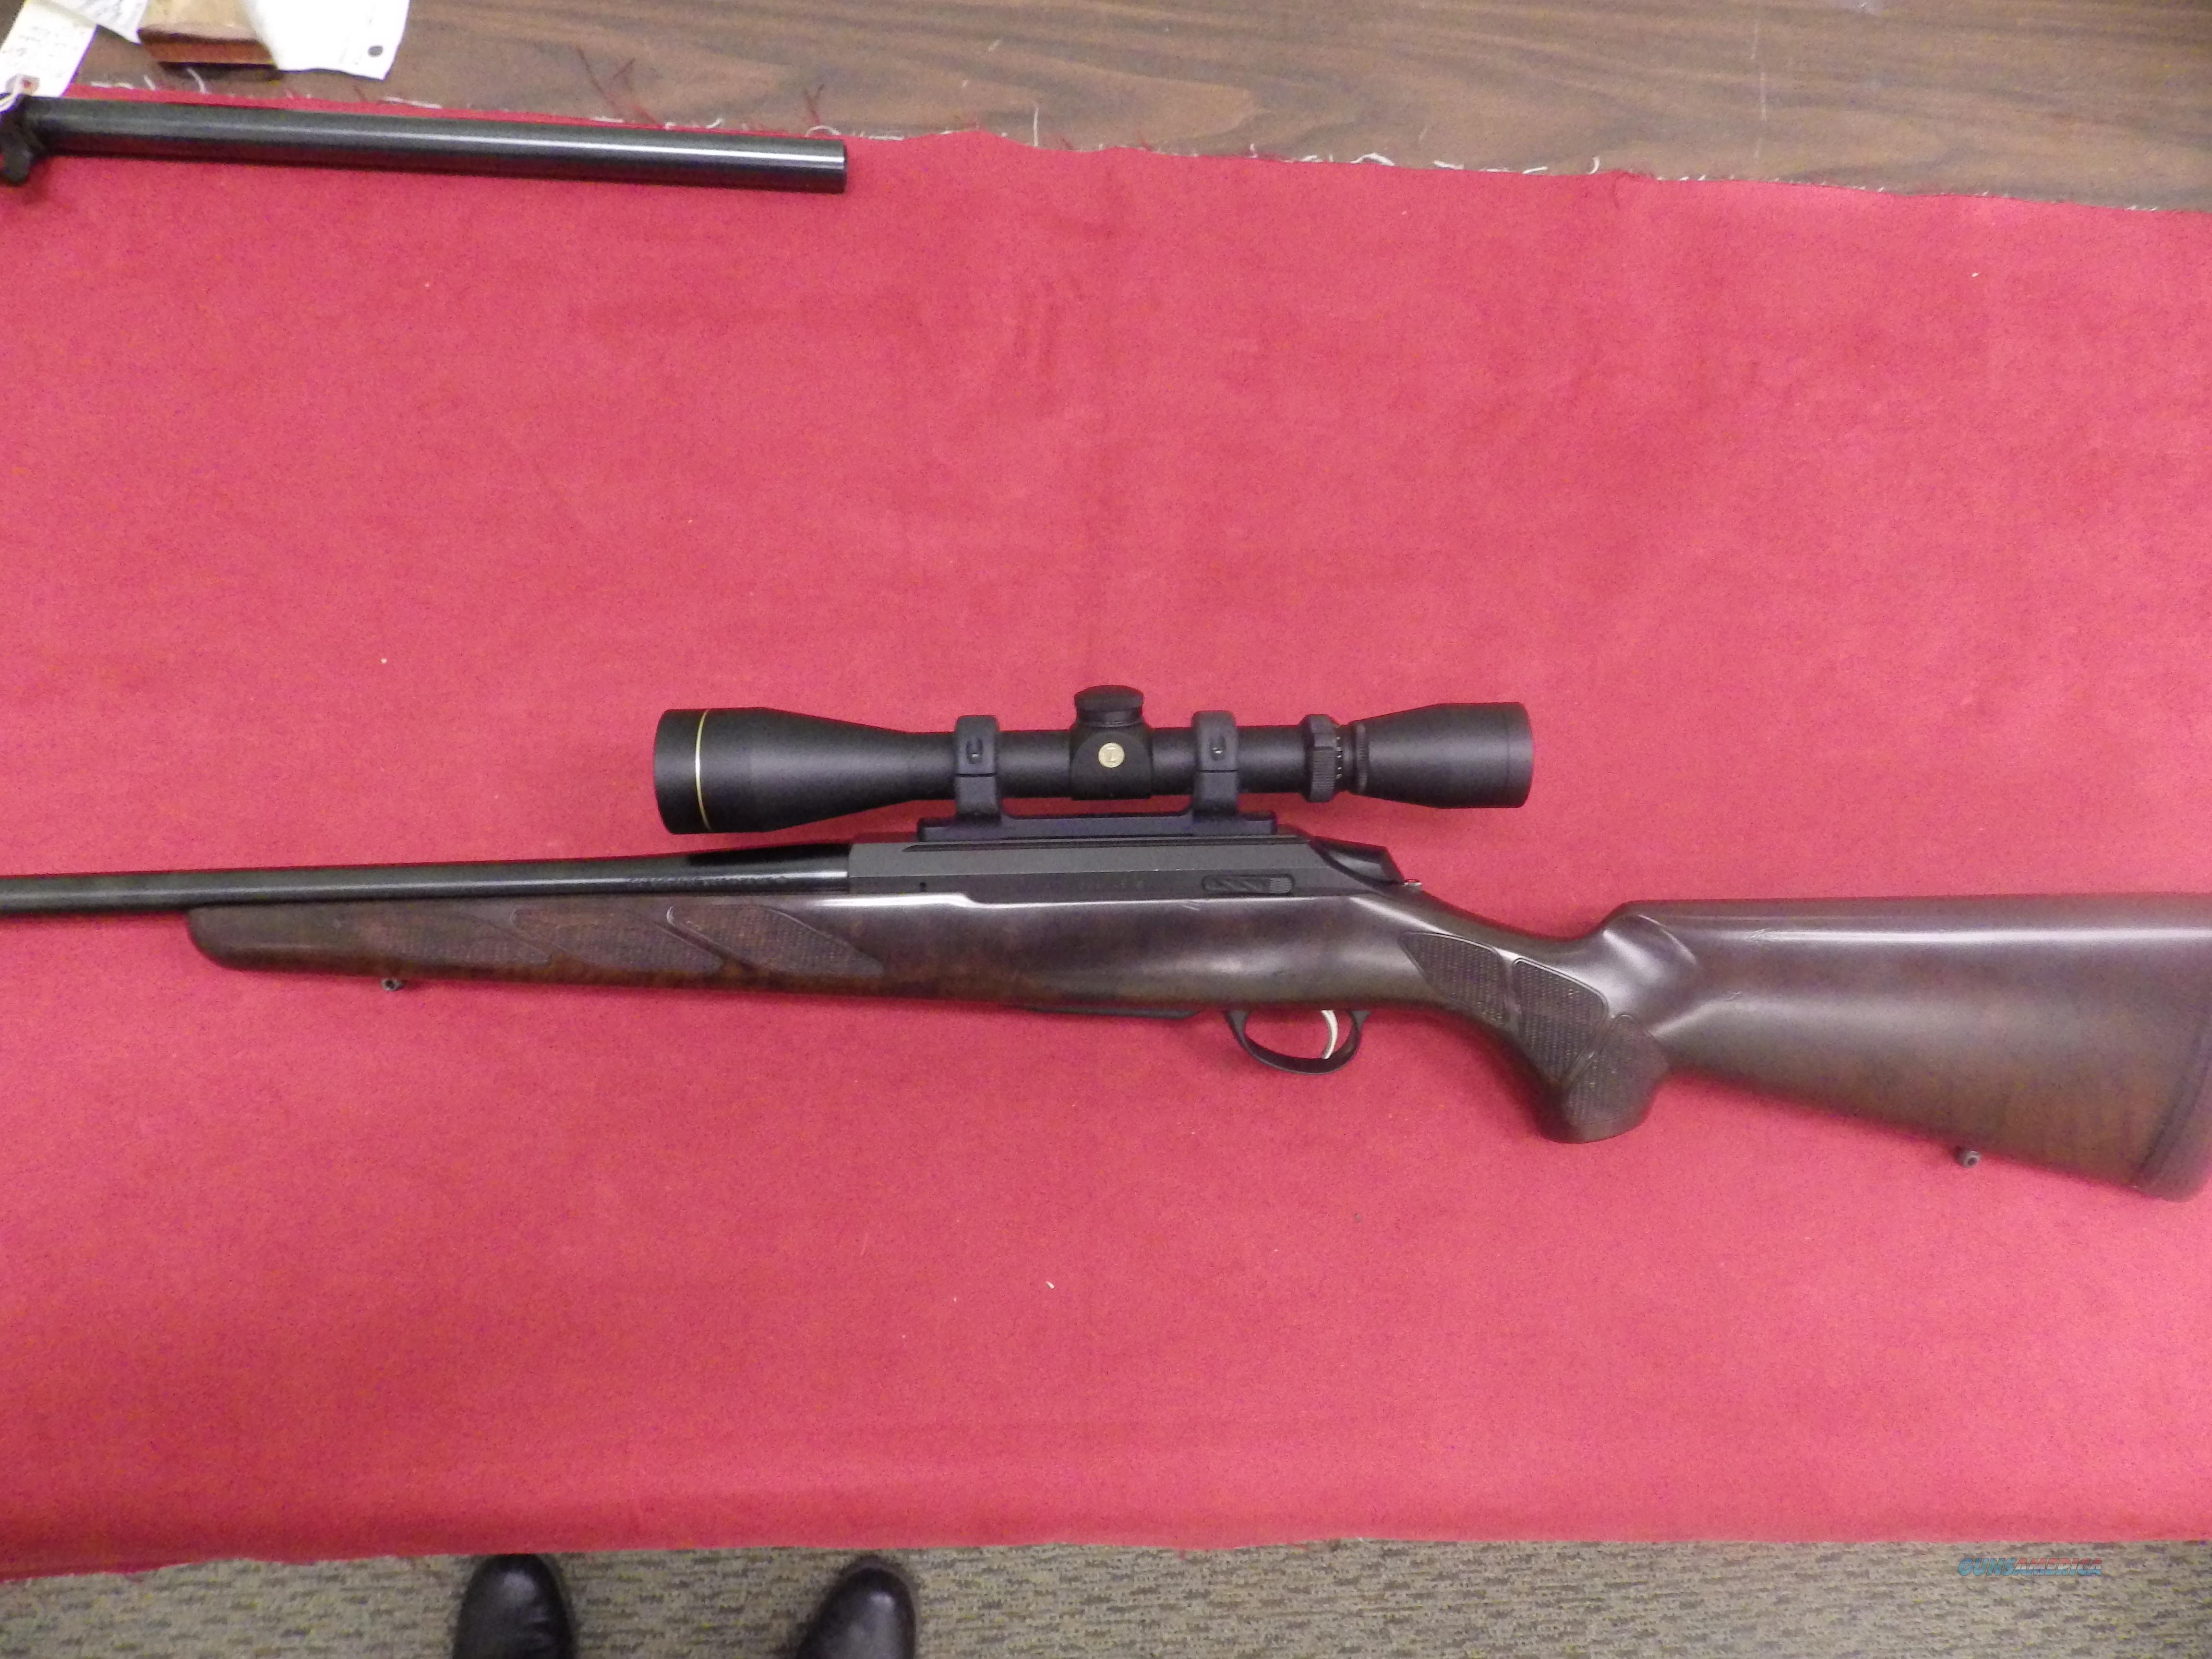 Tikka T3  Guns > Rifles > Tikka Rifles > T3